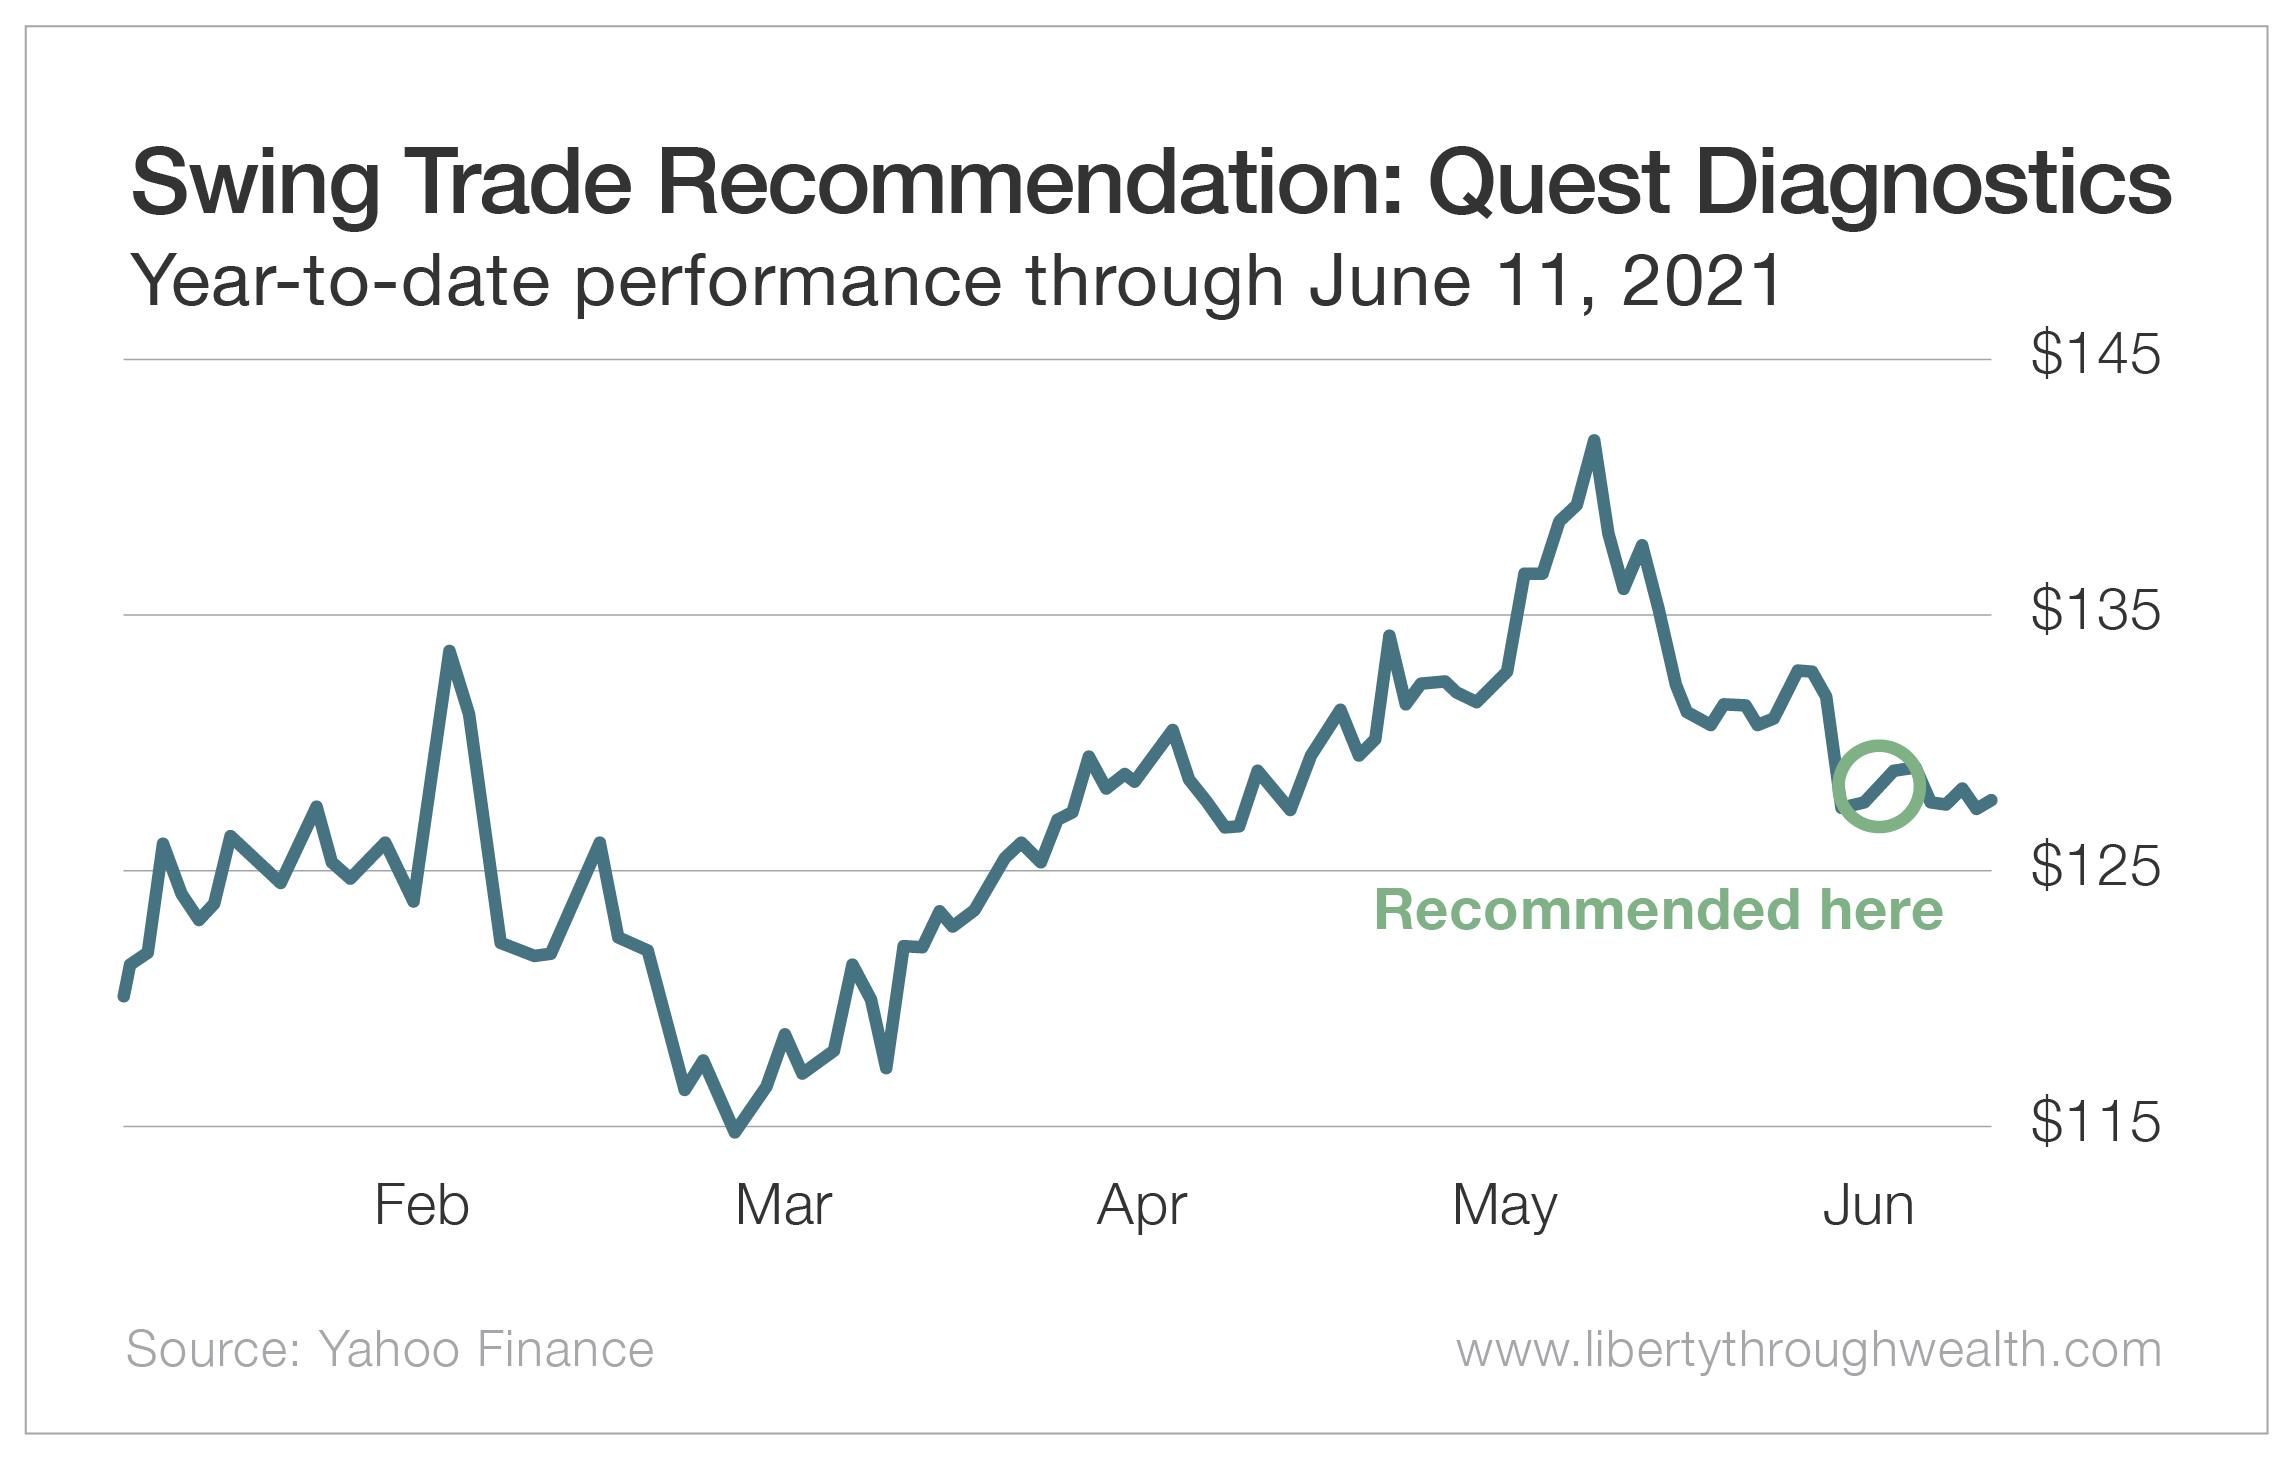 Swing Trade Recommendation: Quest Diagnostics June